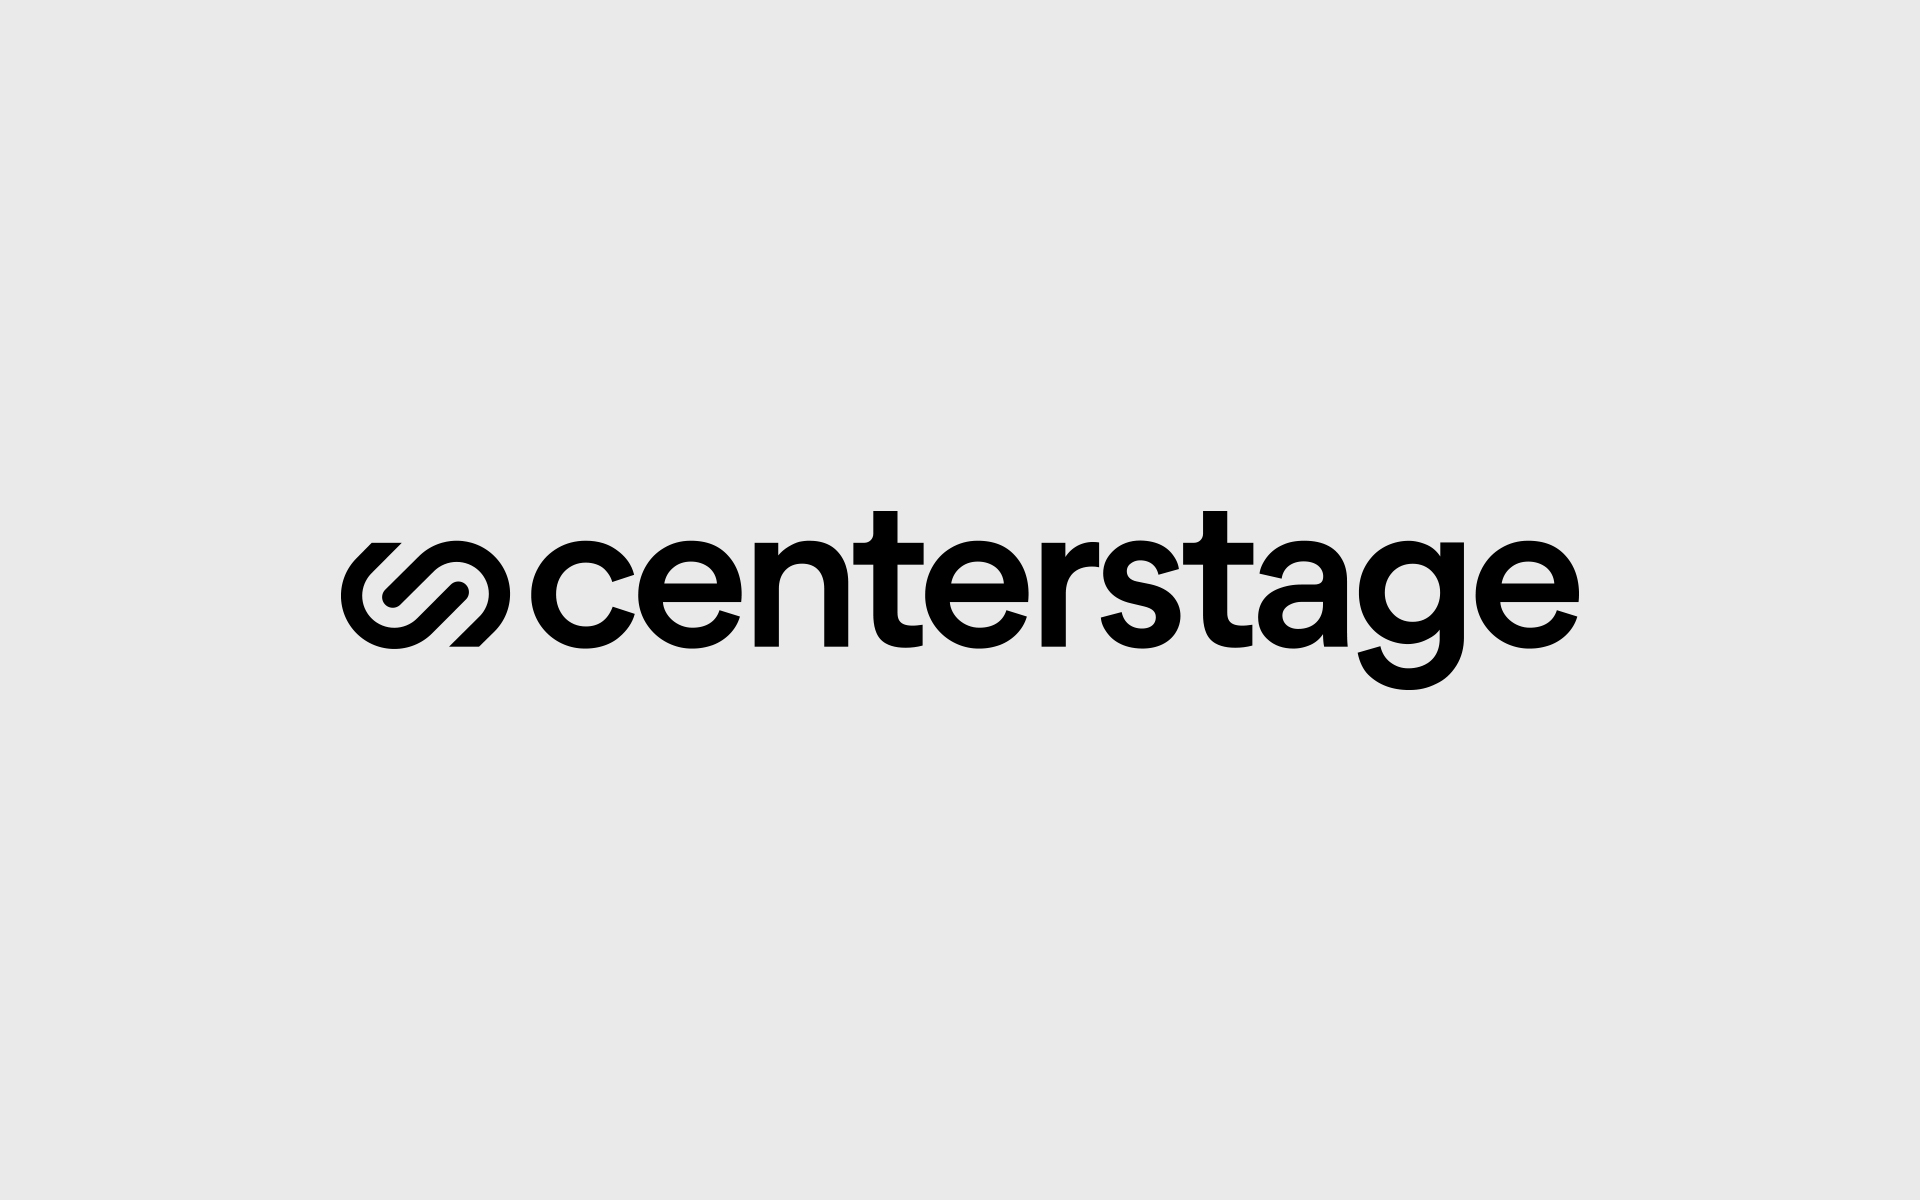 monochromatic Centerstage logo